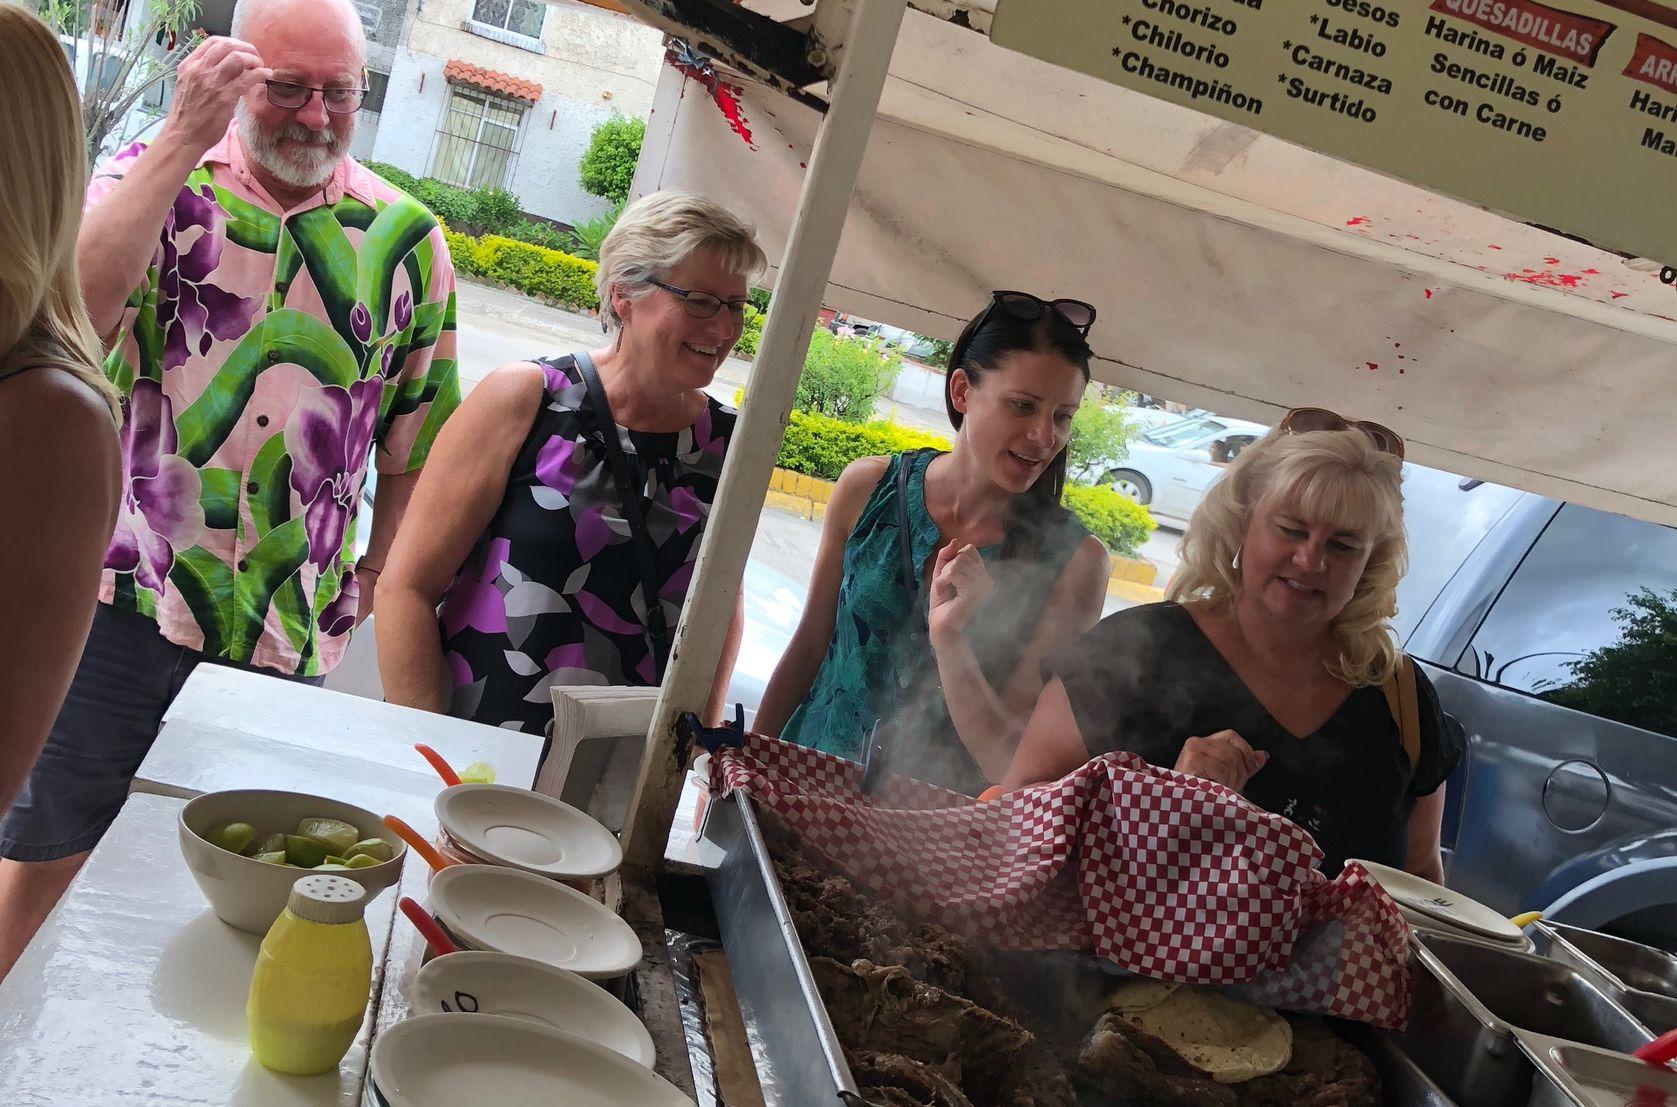 Downtown Food Tasting & Walking Tour in Cabo San Lucas